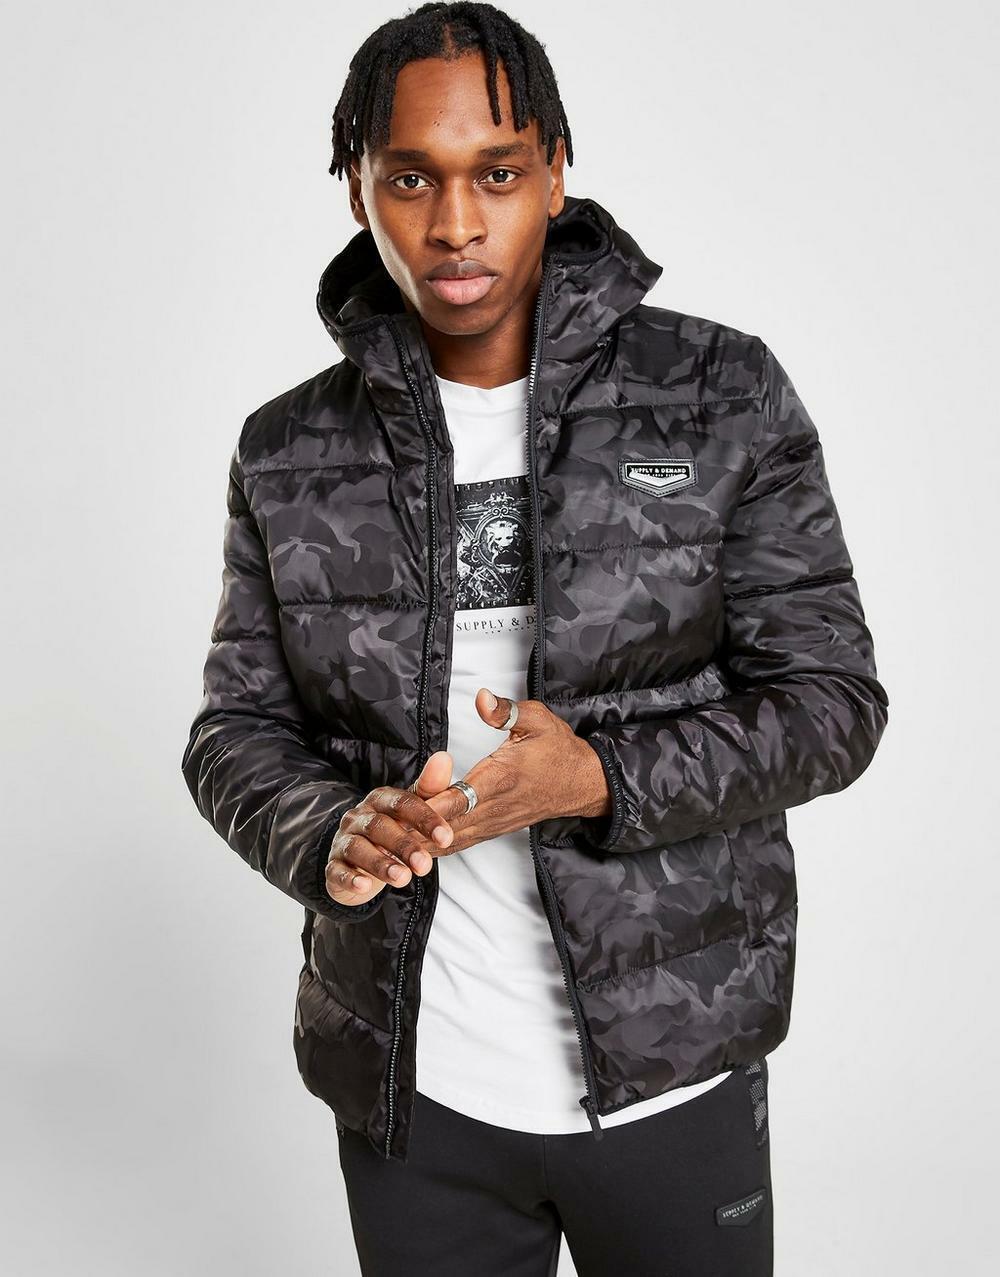 New Supply & Demand Men's Ice Jacket